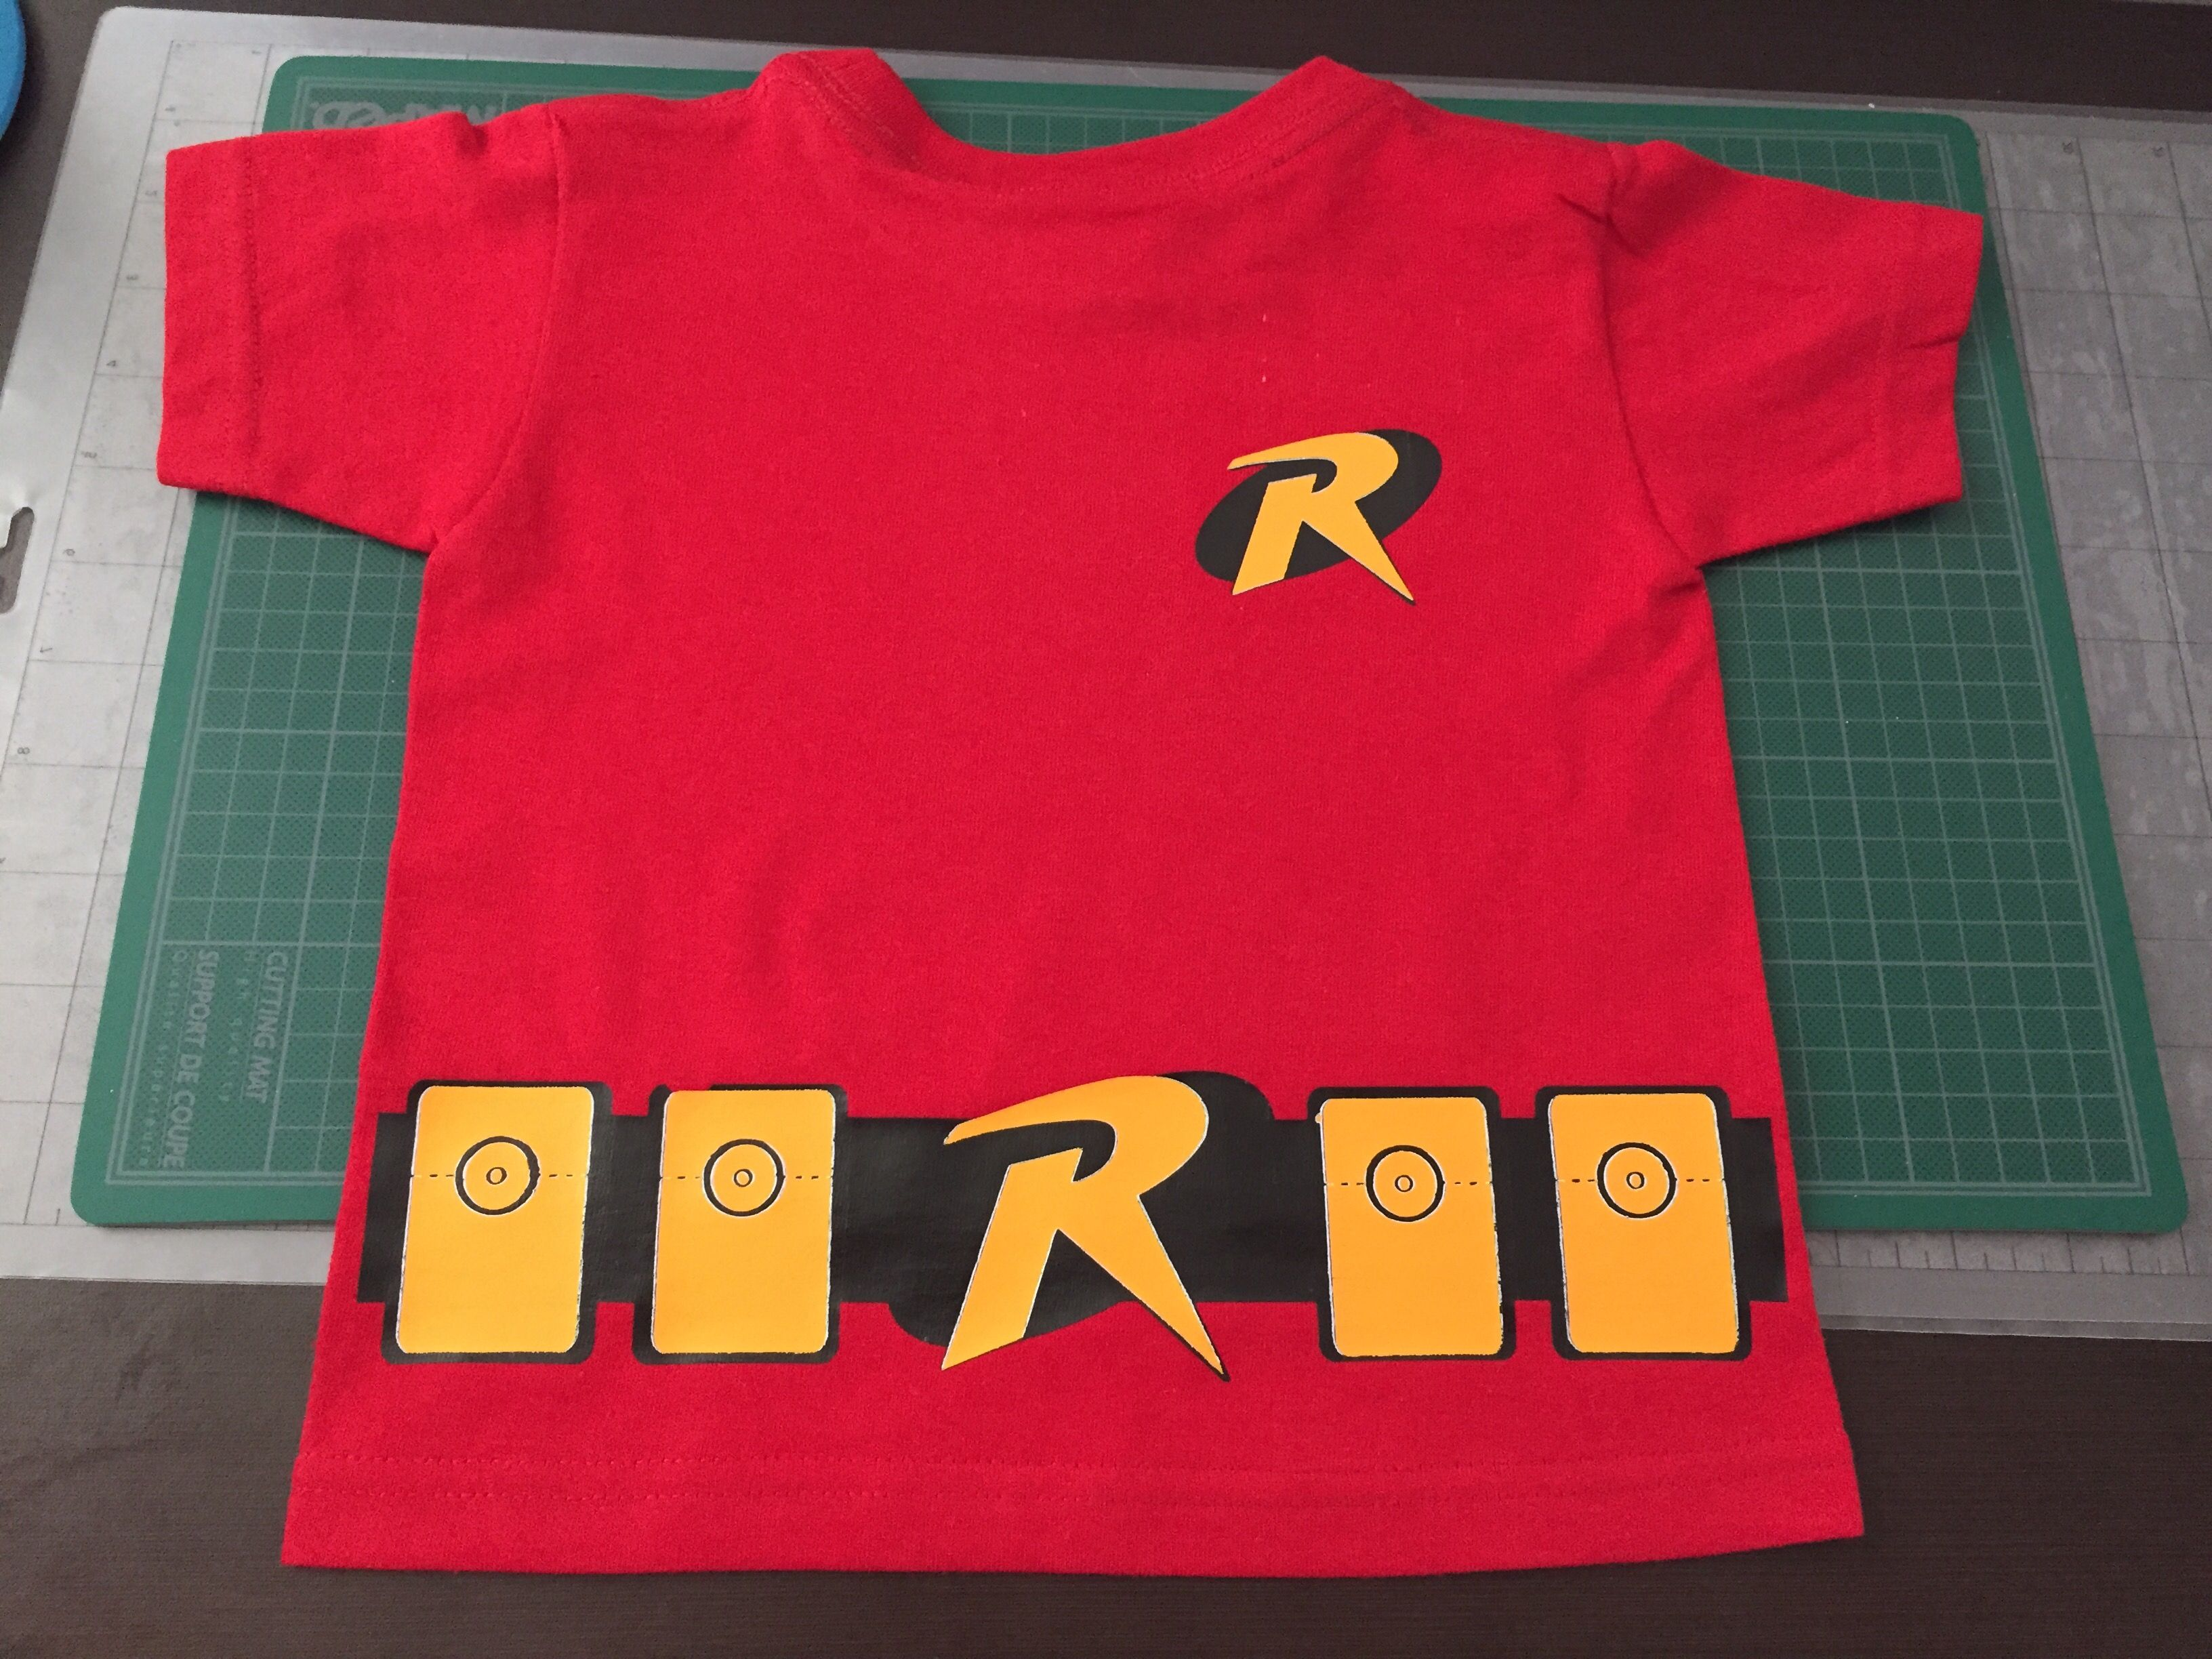 Playera 100% algodón personalizada en vinil textil para niño de 1 año Robin 154fe8a4f3cce